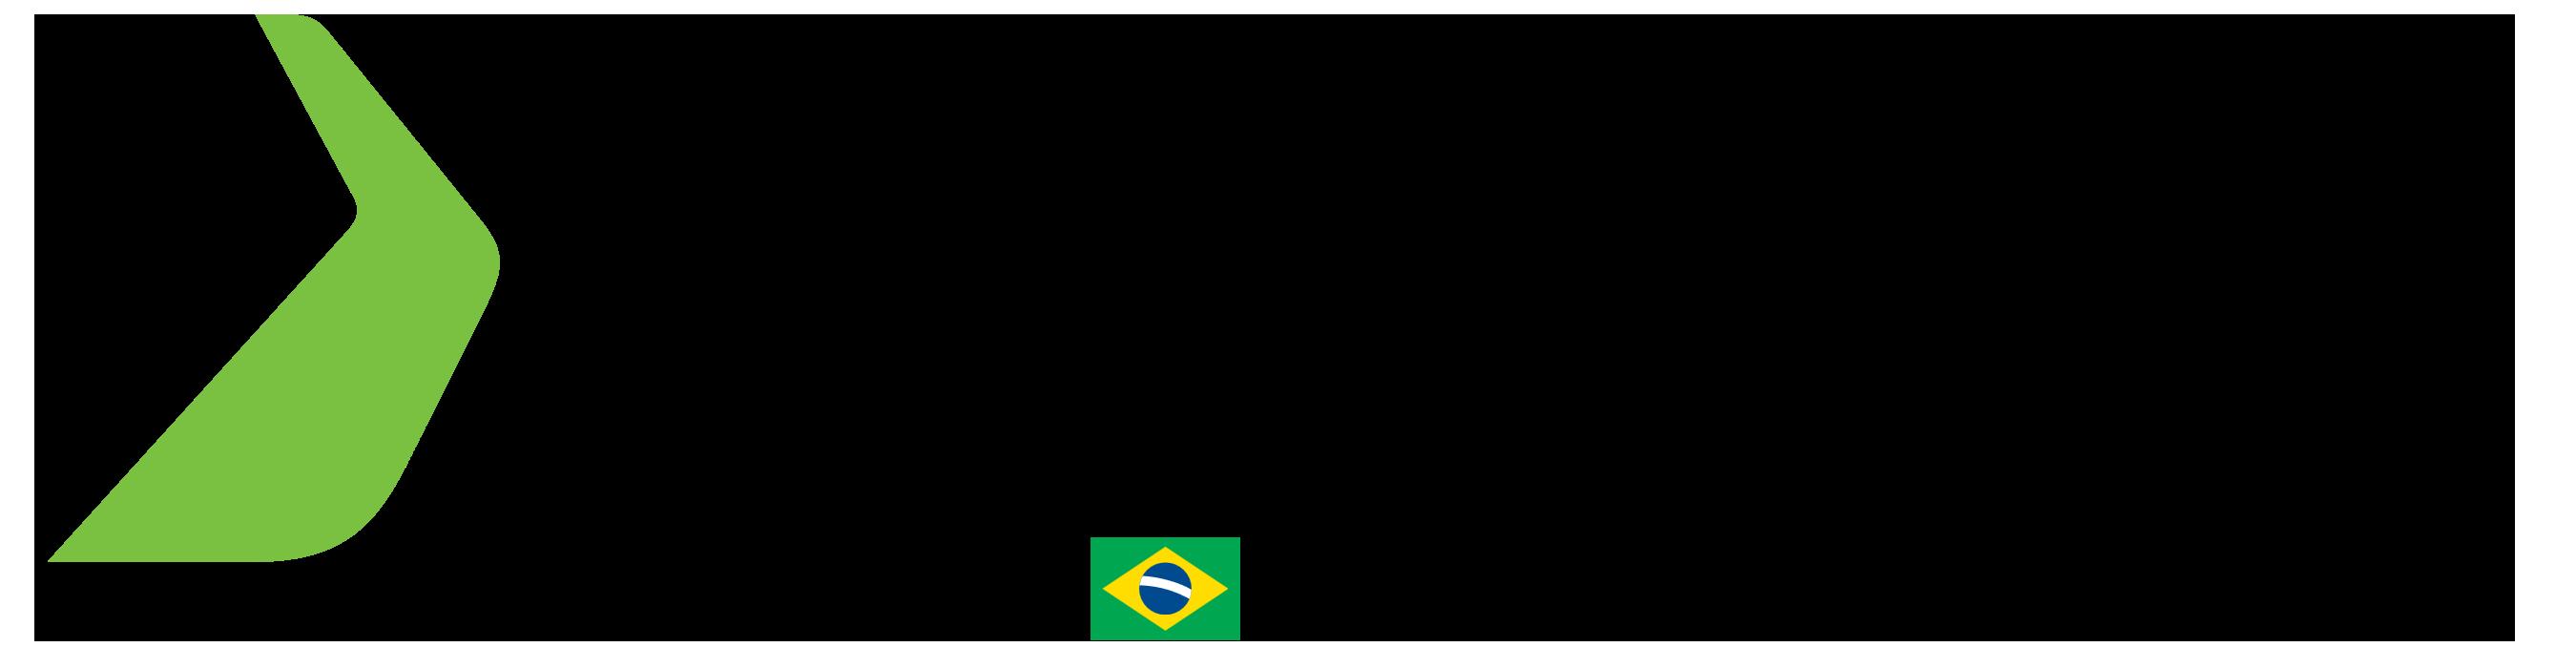 rider sandals � logos download